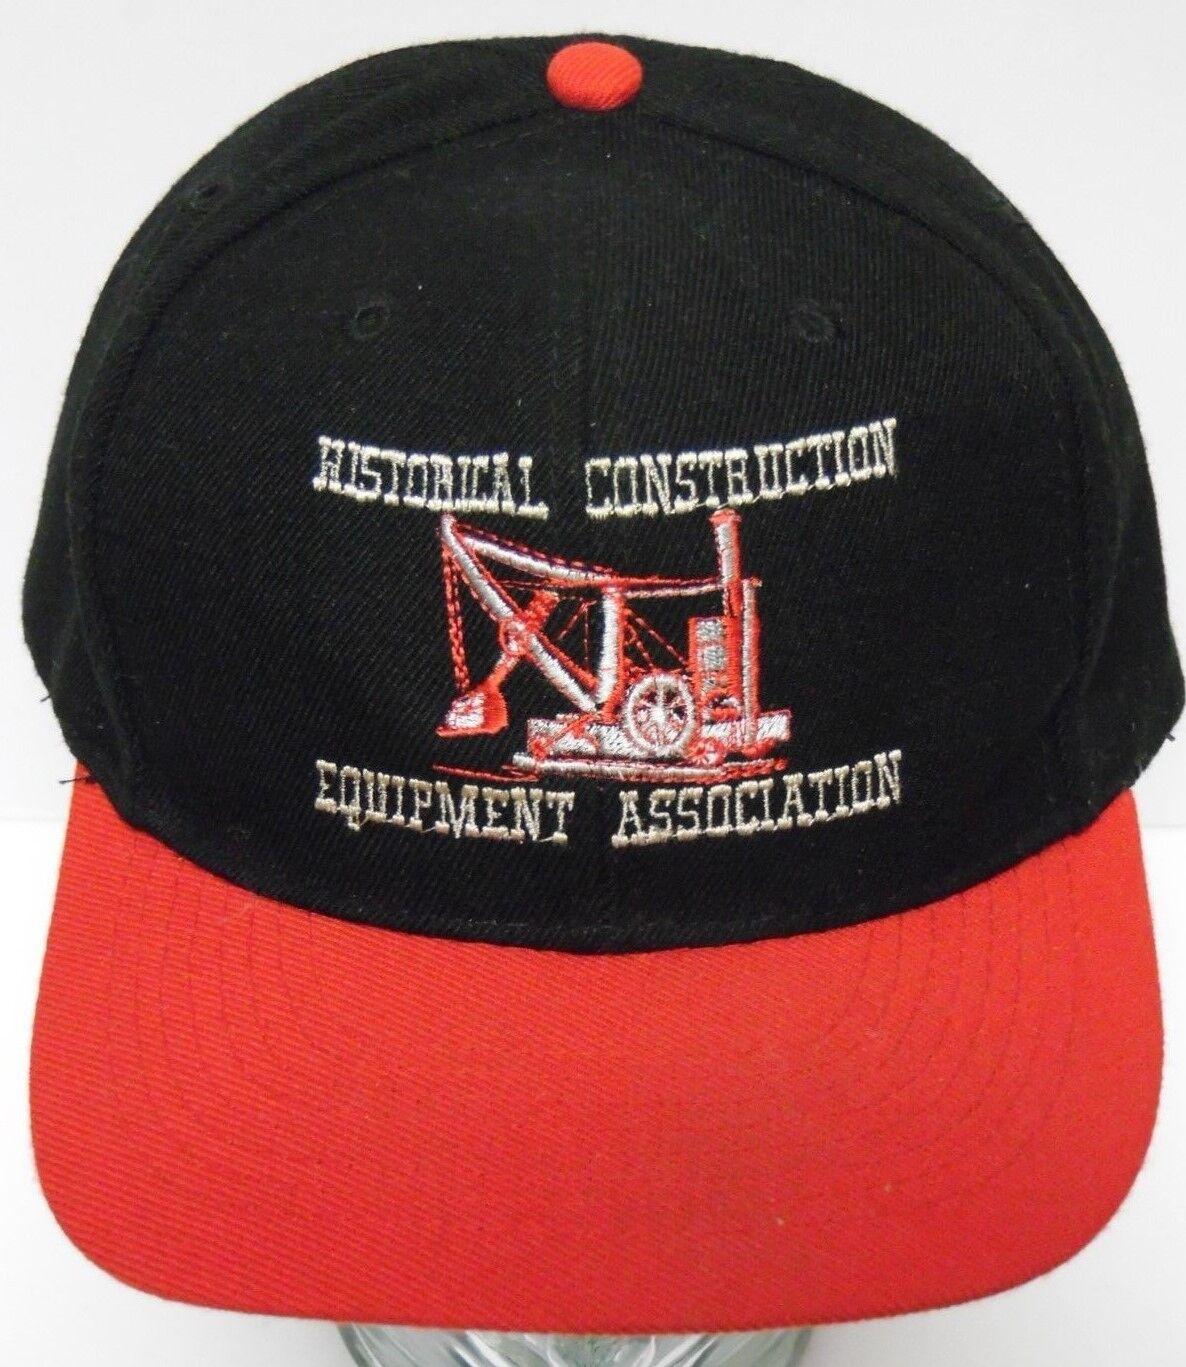 Vtg 1990s HISTORICAL CONSTRUCTION Black EQUIPMENT SNAPBACK ADVERTISING Red Black CONSTRUCTION HAT fa2ece